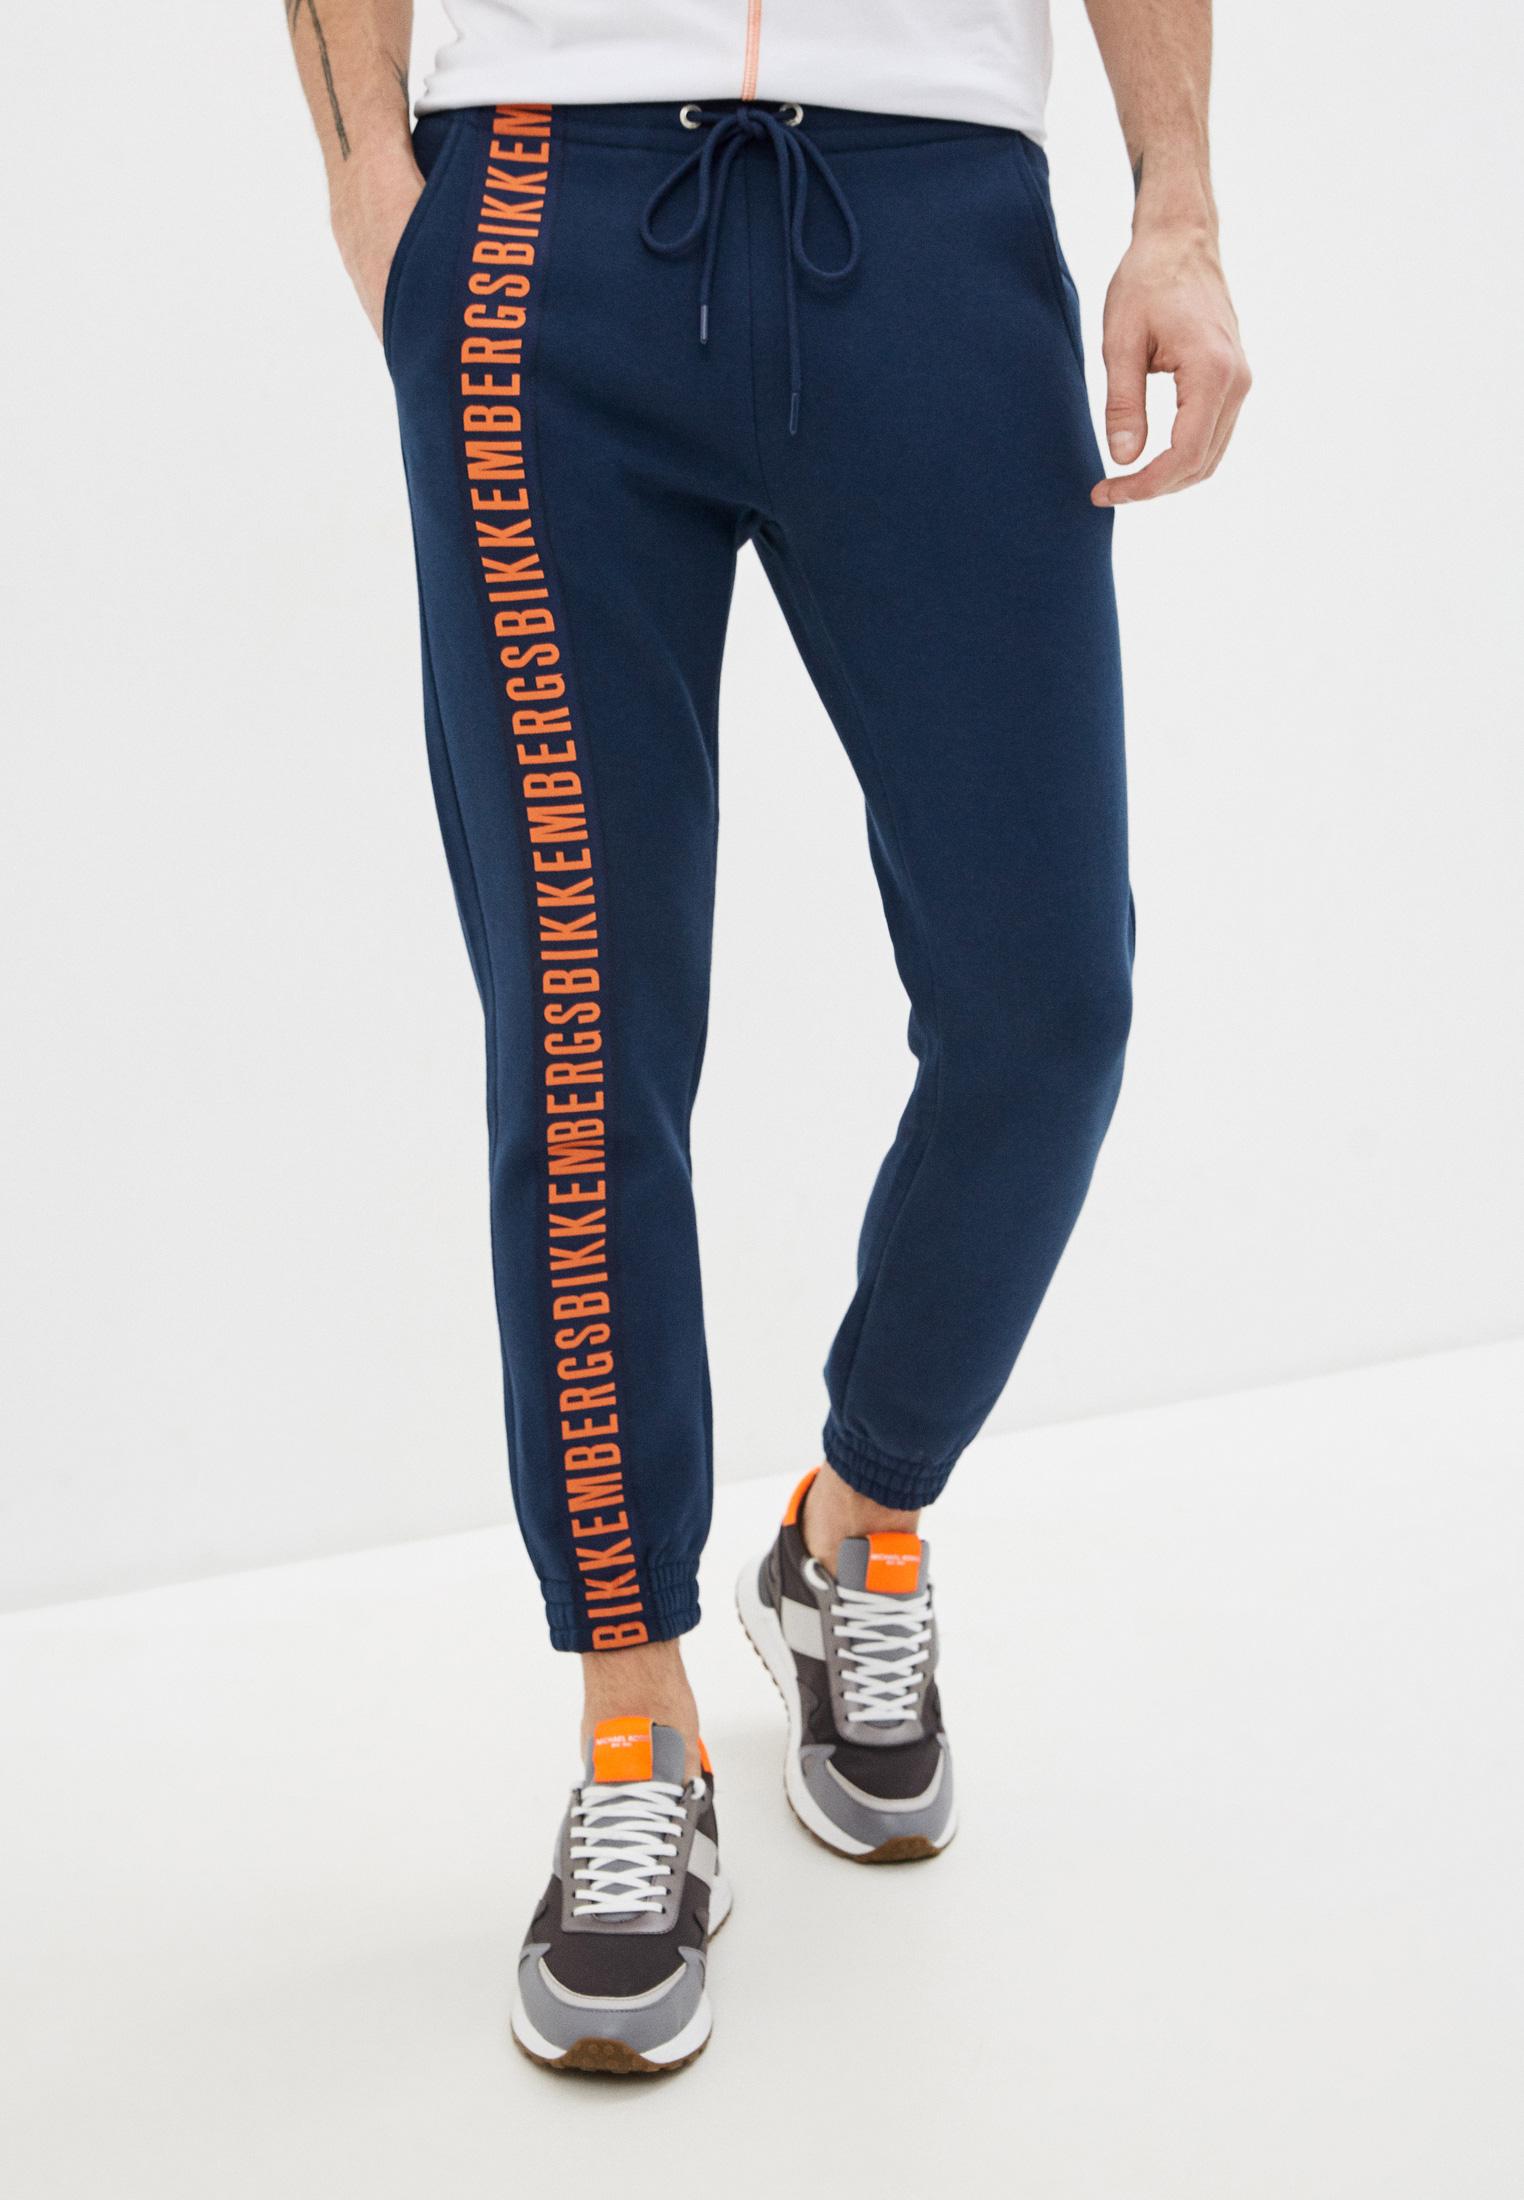 Мужские спортивные брюки Bikkembergs (Биккембергс) C 1 123 80 M 4175